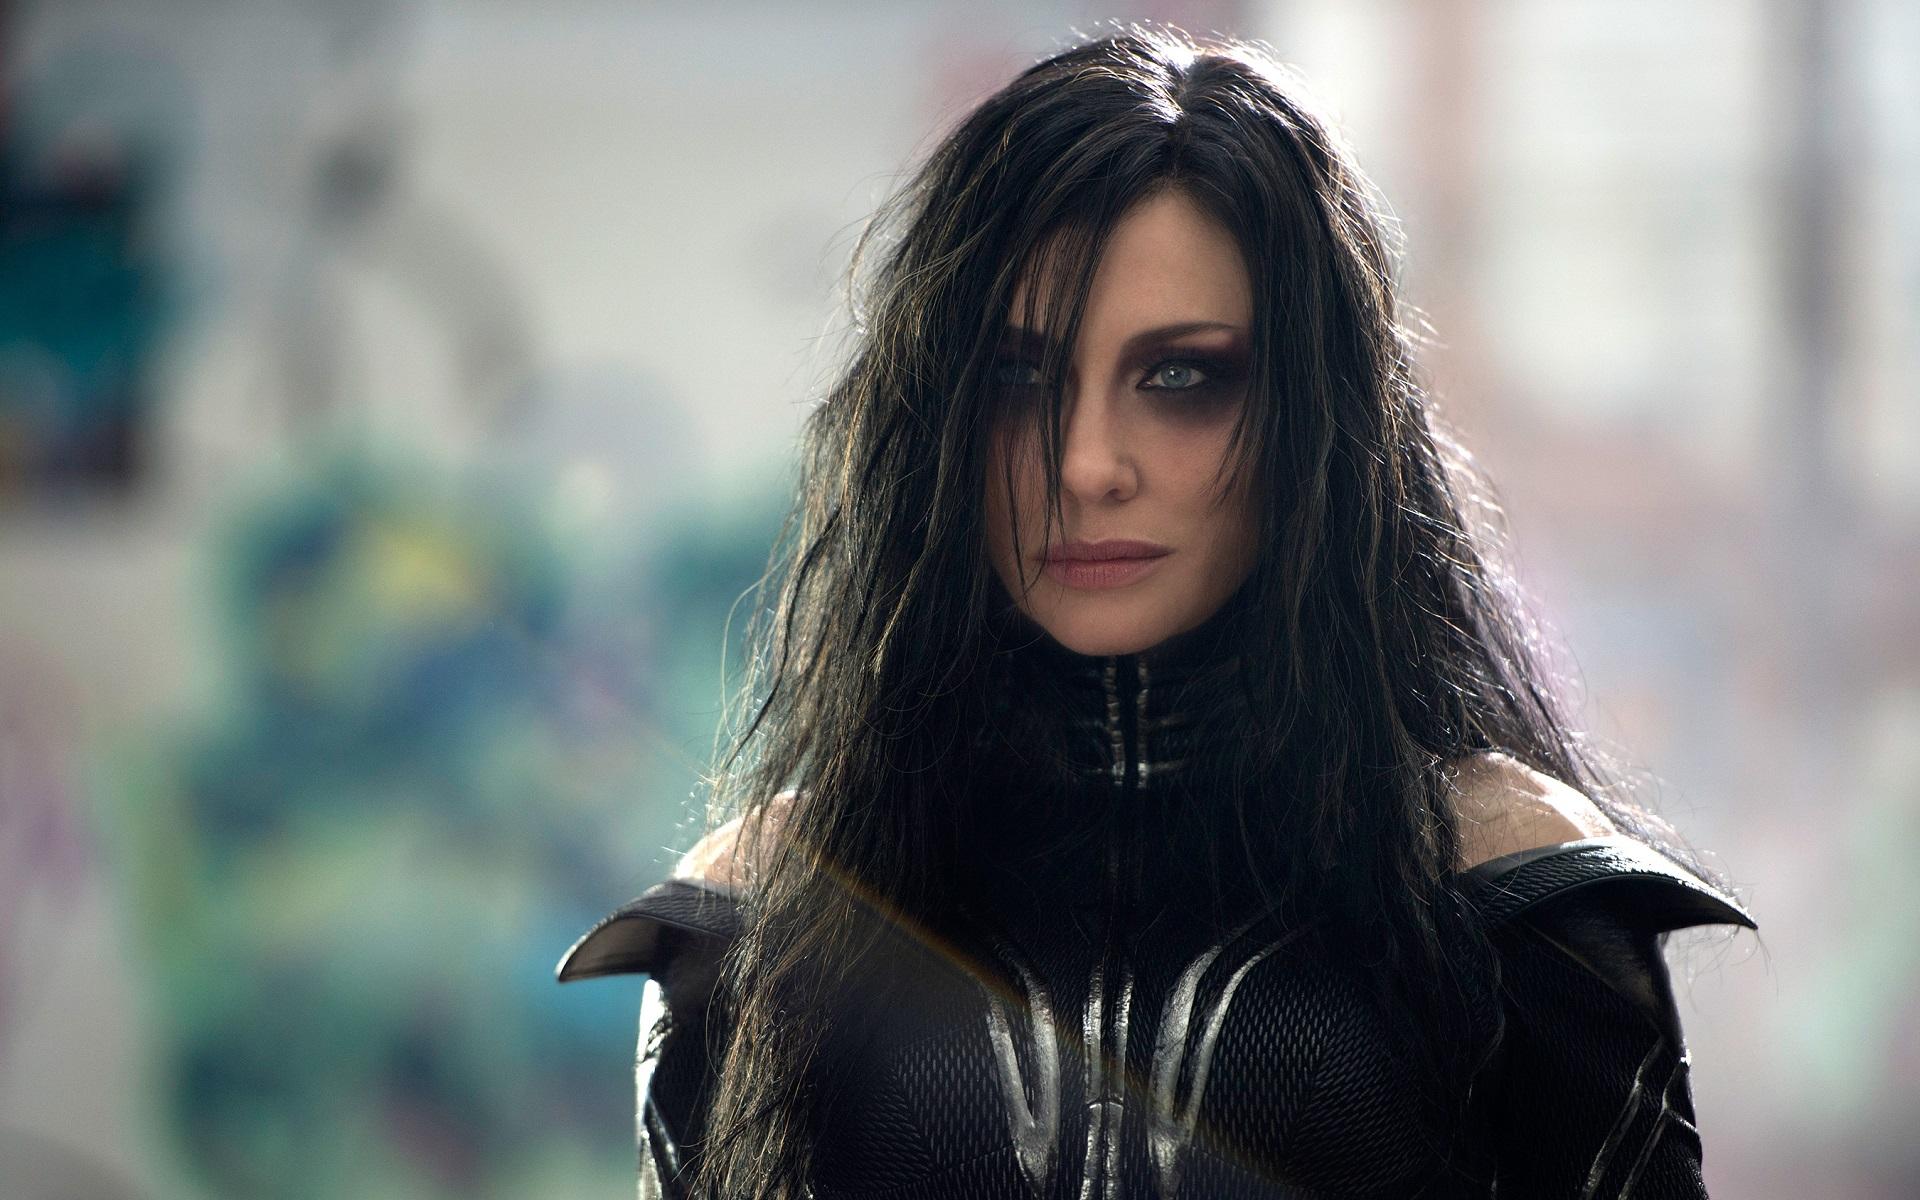 Wonderful Wallpaper Marvel Face - Cate-Blanchett-hela-Thor-Thor-Ragnarok-Marvel-Comics-Marvel-Cinematic-Universe-women-dark-hair-blue-eyes-actress-smoky-eyes-hair-in-face-1198586  Collection_457874.jpg